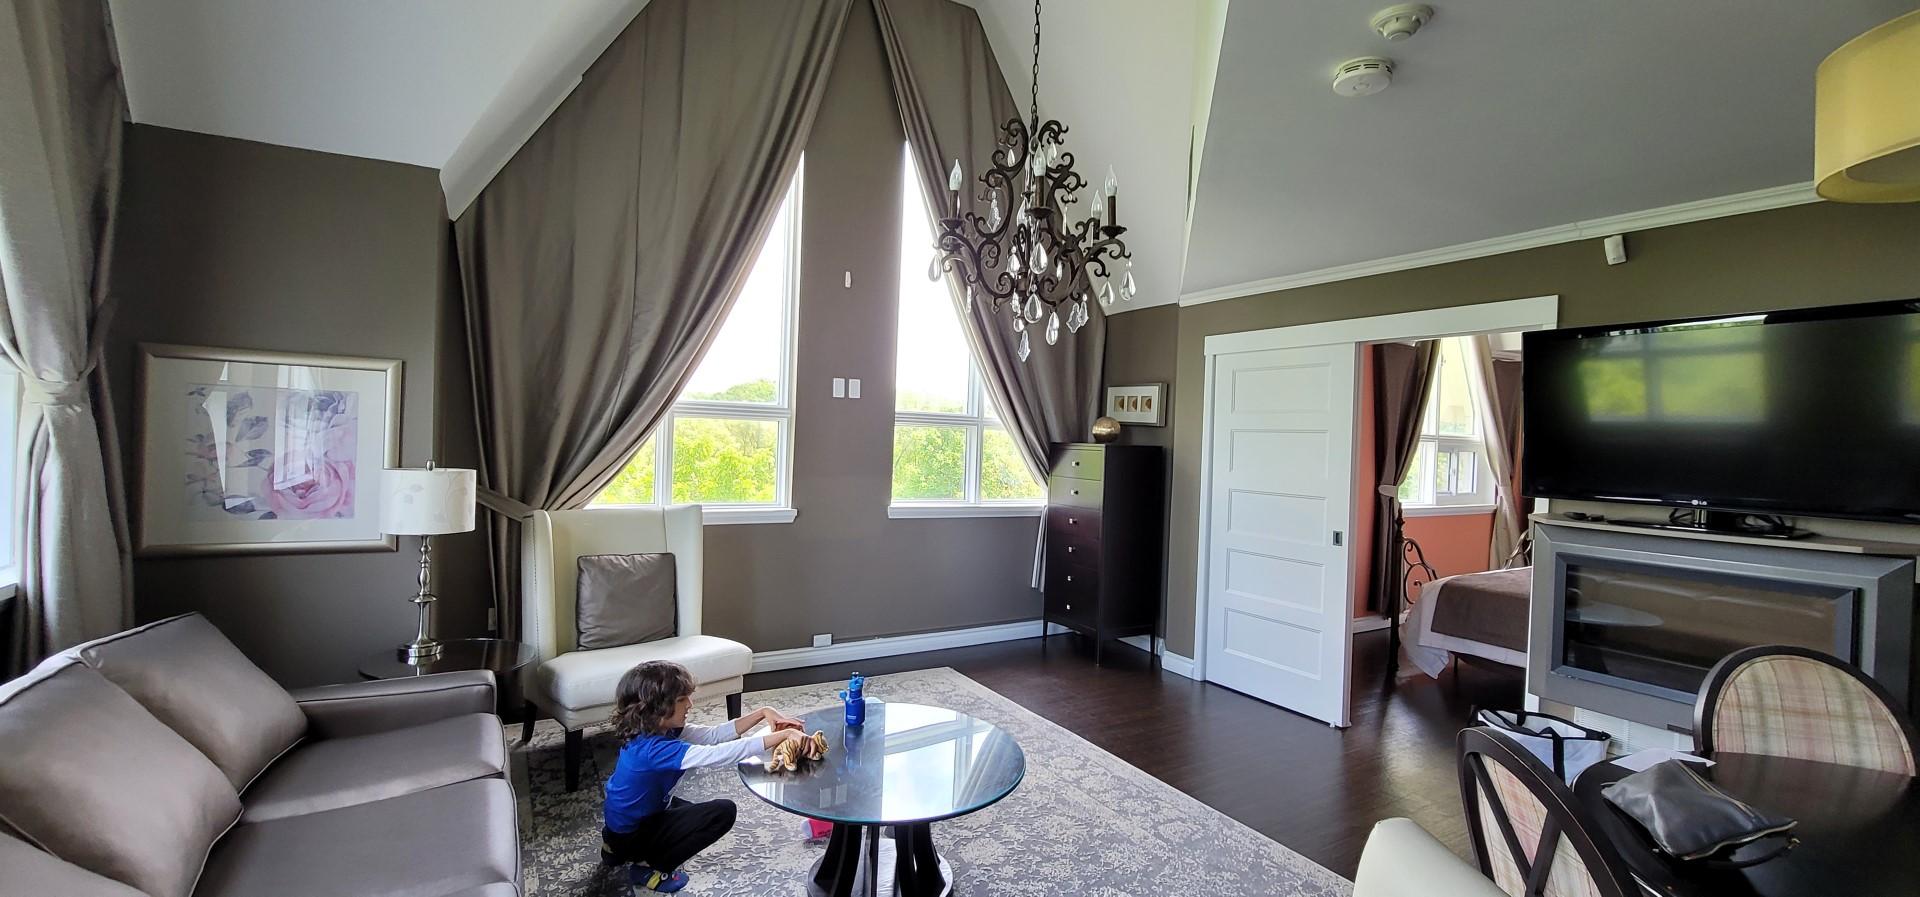 Living room at elmhurst